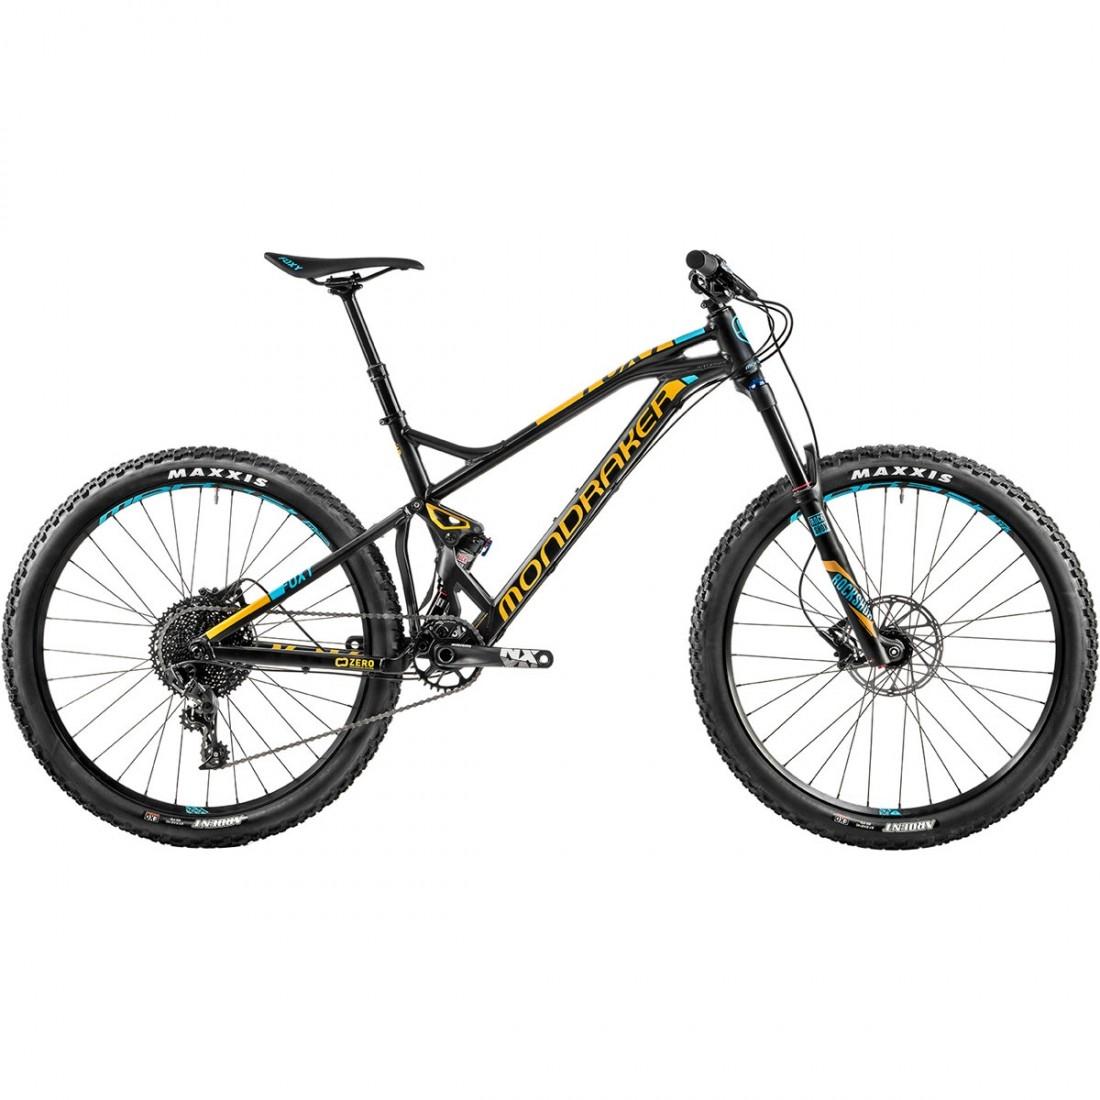 Bicicleta De Montana Mondraker Foxy 27 5 Black